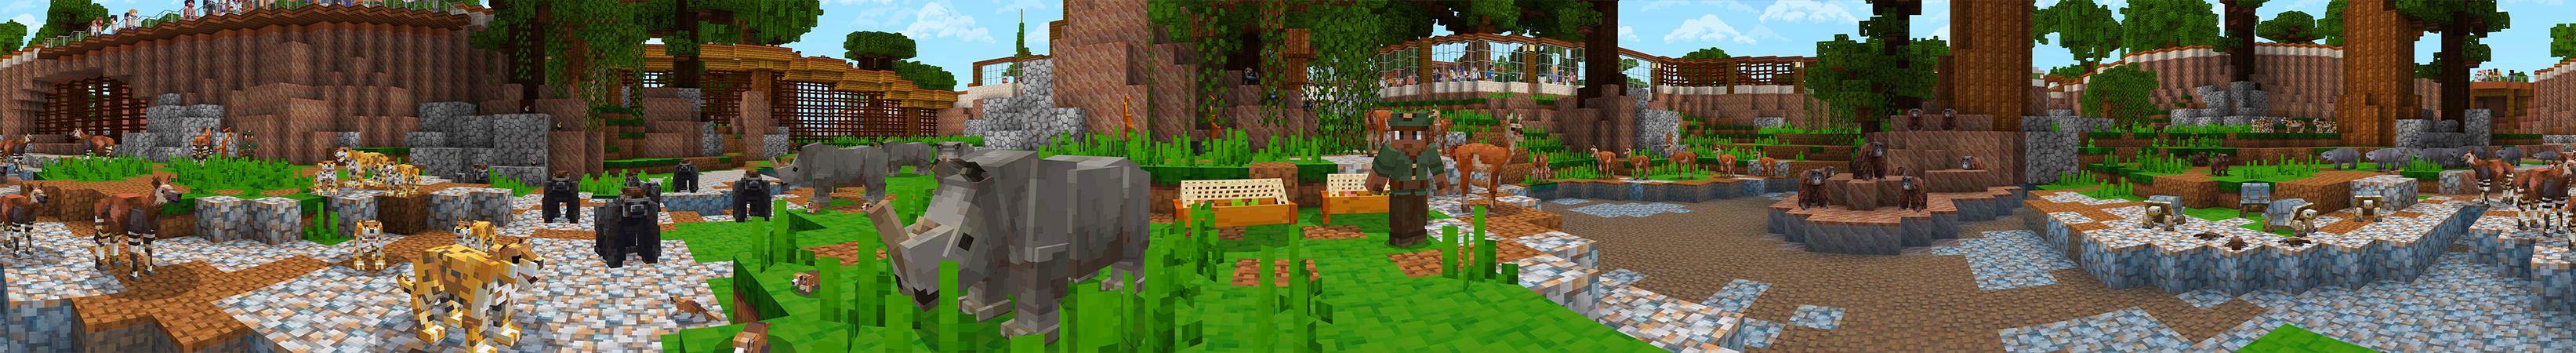 MINE ZOO 9 in Minecraft Marketplace  Minecraft